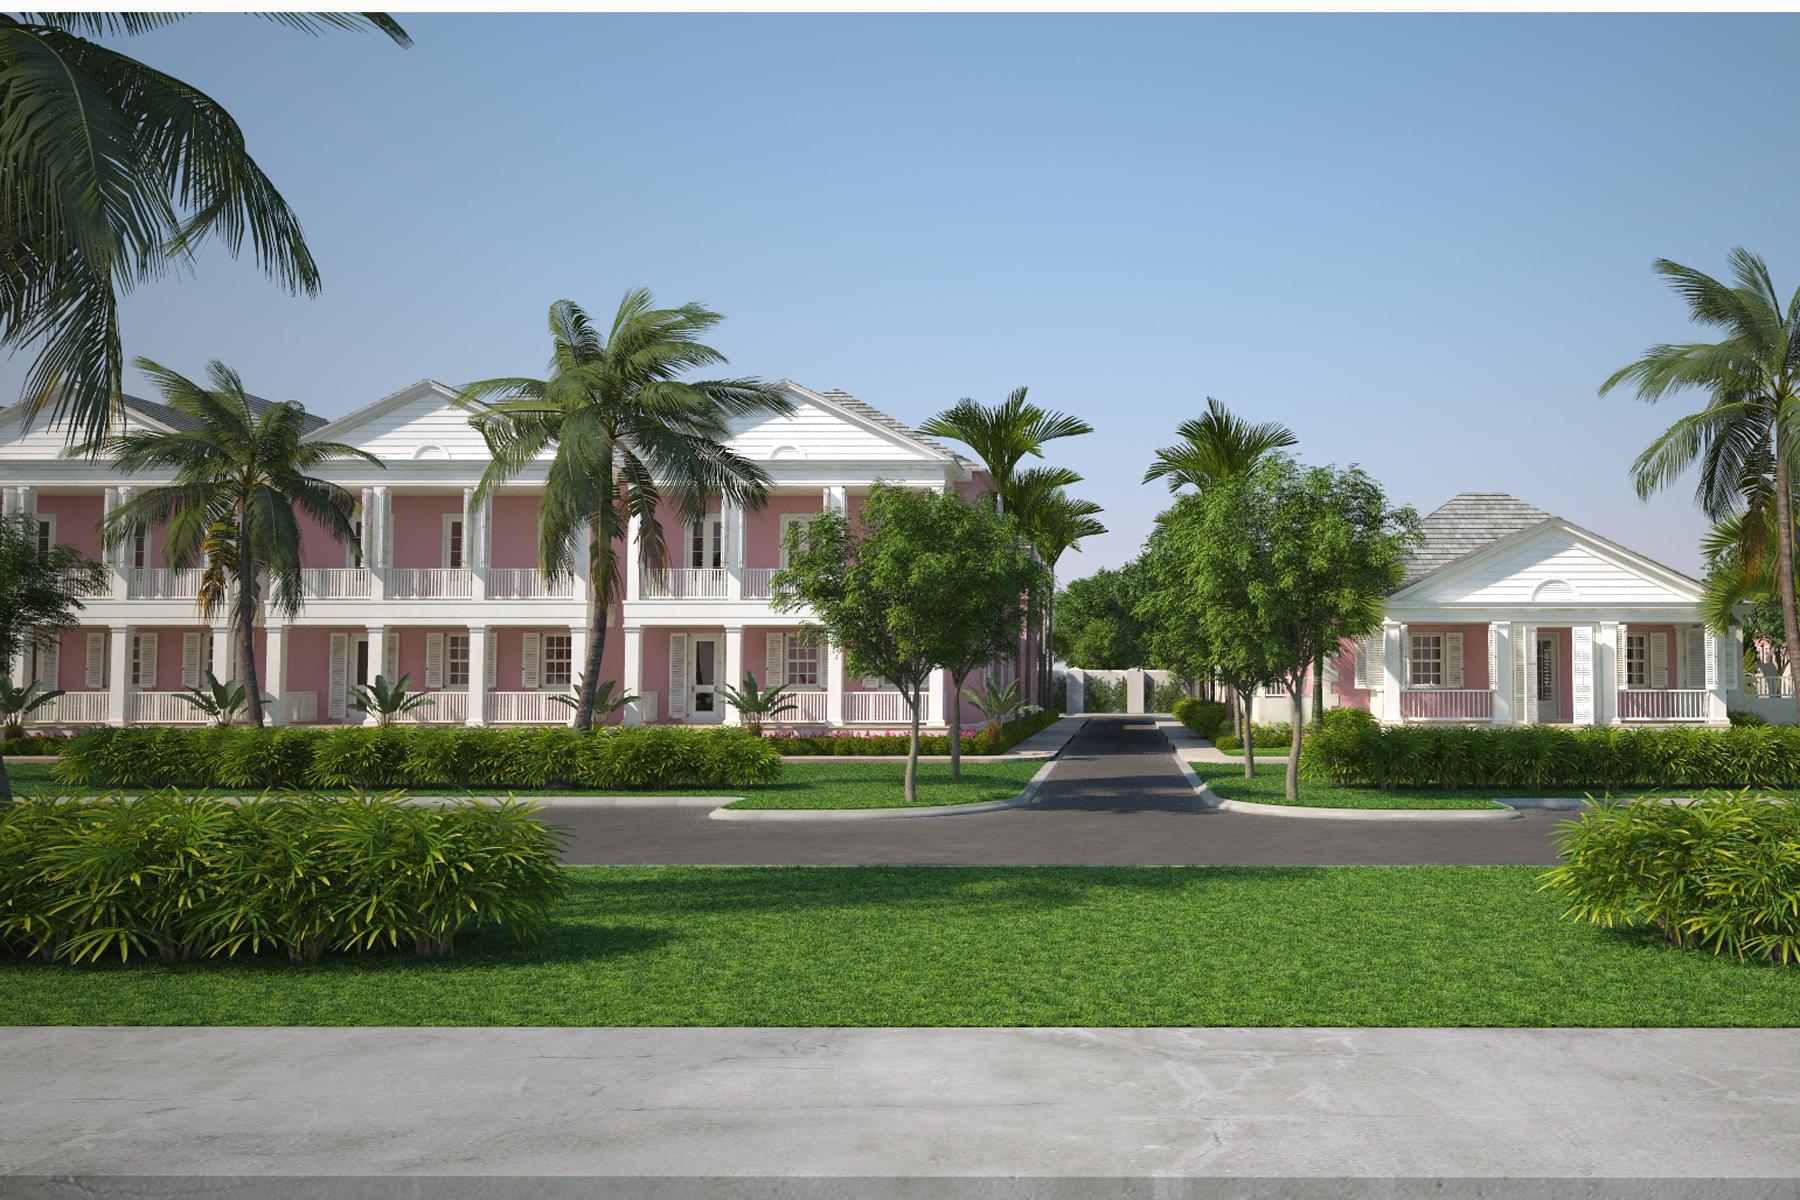 Residência urbana para Venda às Yachr Harbour Townhouse #15 Lyford Cay, Nova Providência / Nassau, Bahamas